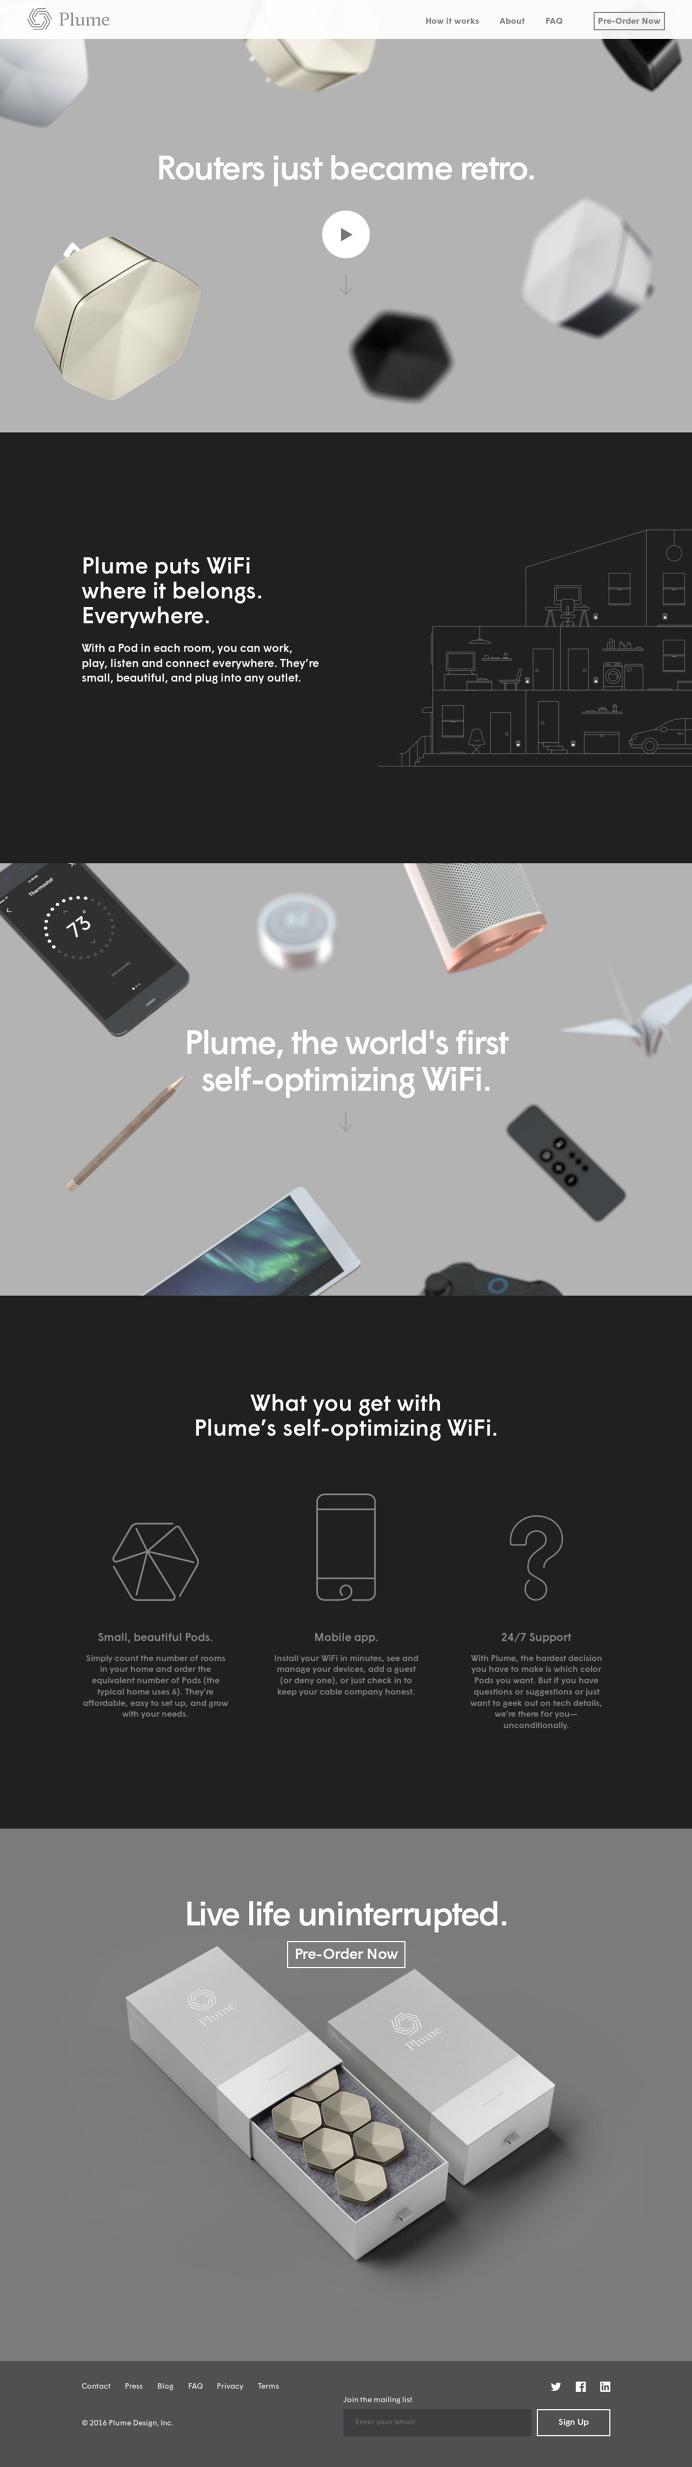 Plume, more WiFi